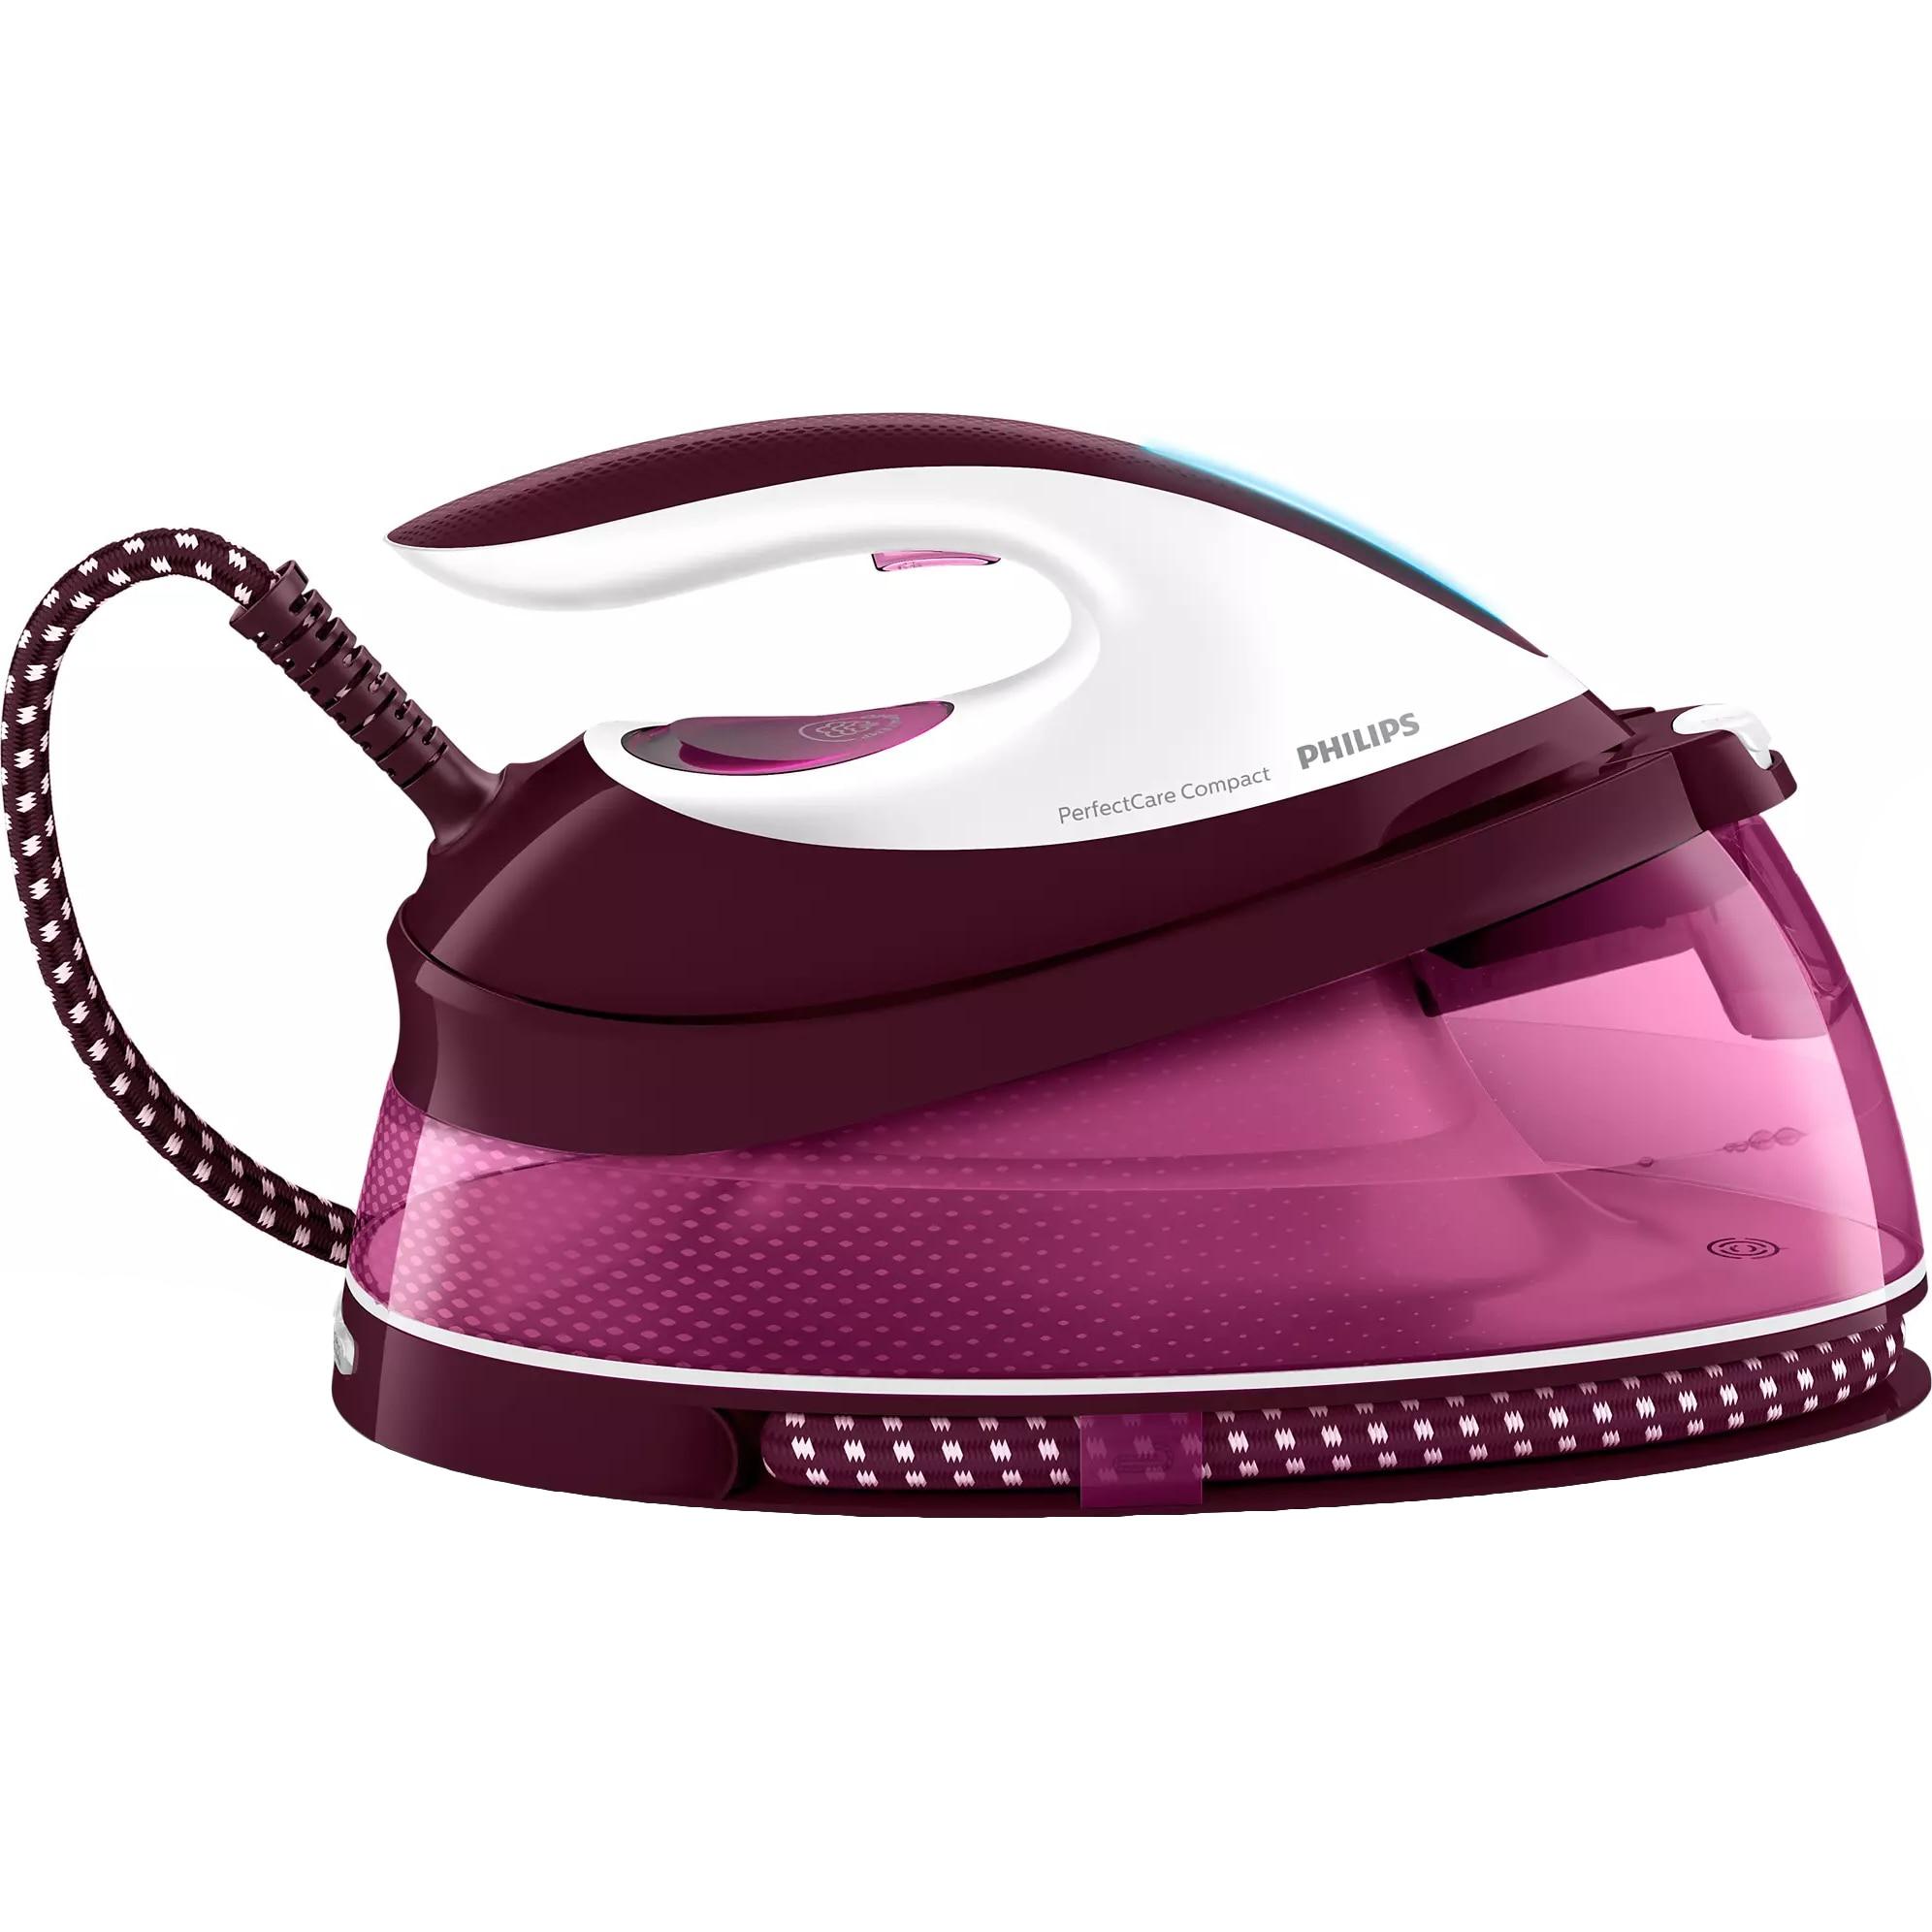 Fotografie Statie de calcat Philips PerfectCare Compact GC7842/40, Optimal Temp, talpa Steam Glide, 120 g/min, 400 g abur, 6.5 bari, rezervor 1500 ml, Smart Calc Clean, Violet